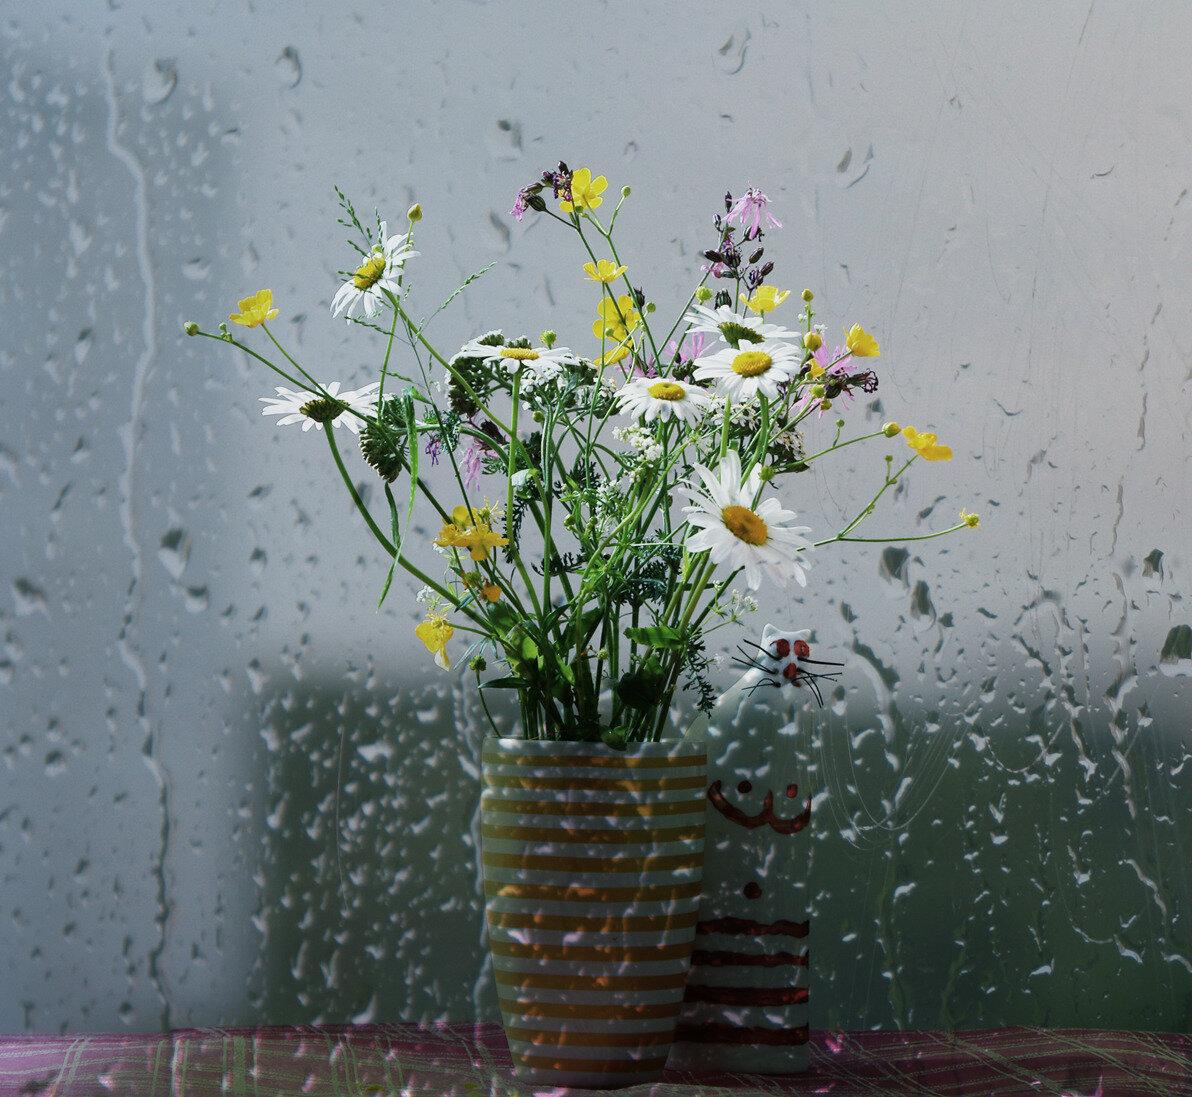 себе такое картинки дождливое утро на даче решении